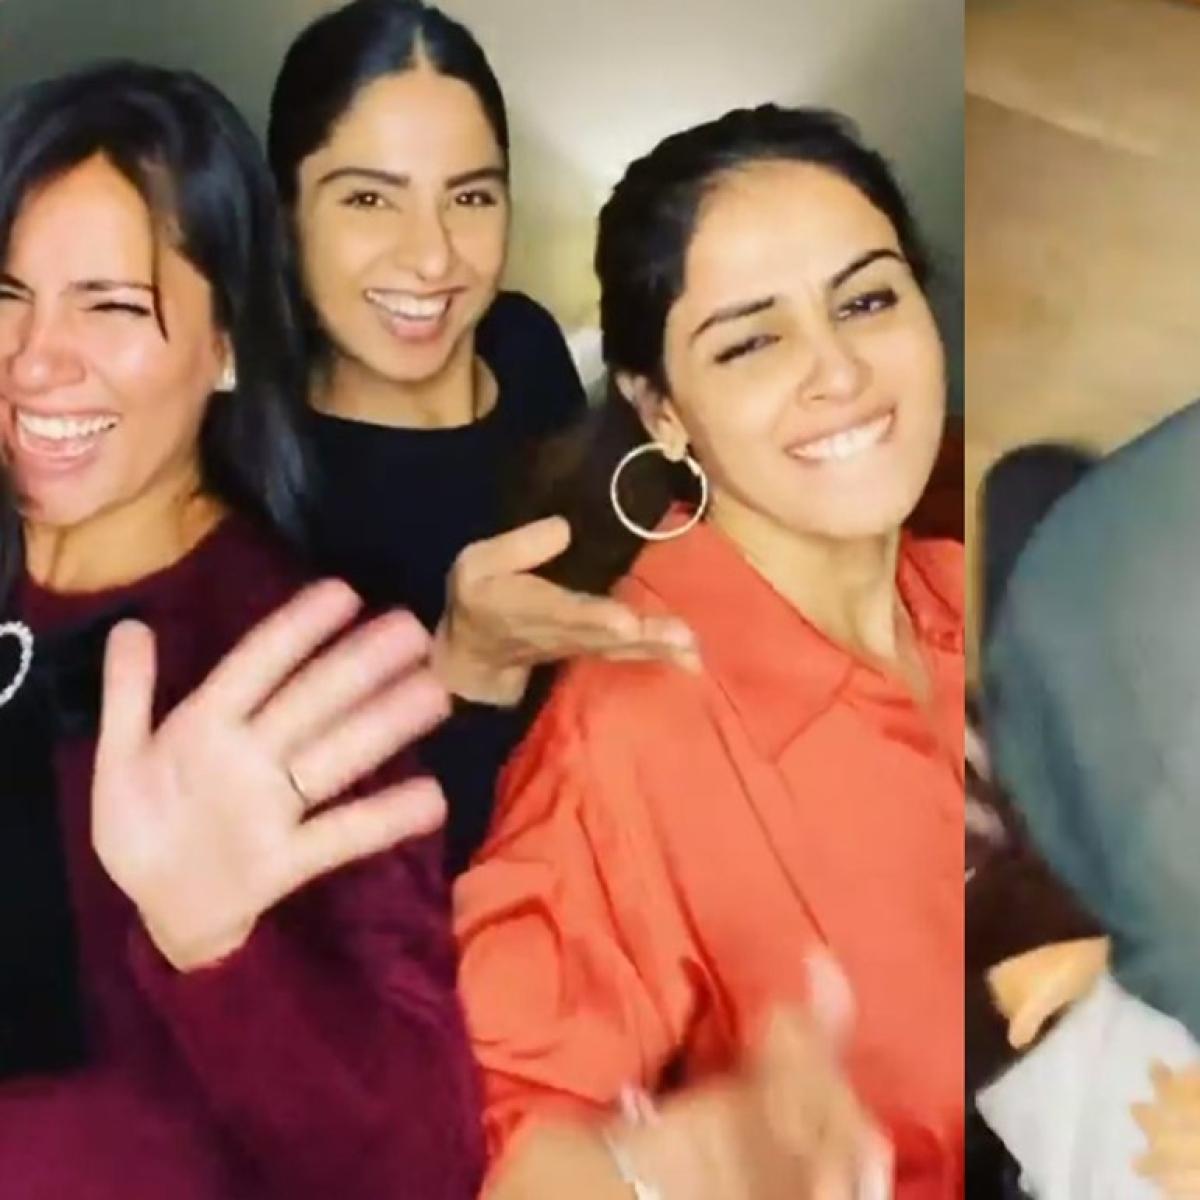 Watch: Genelia falls down while dancing on 'Zhingat' with husband Riteish Deshmukh